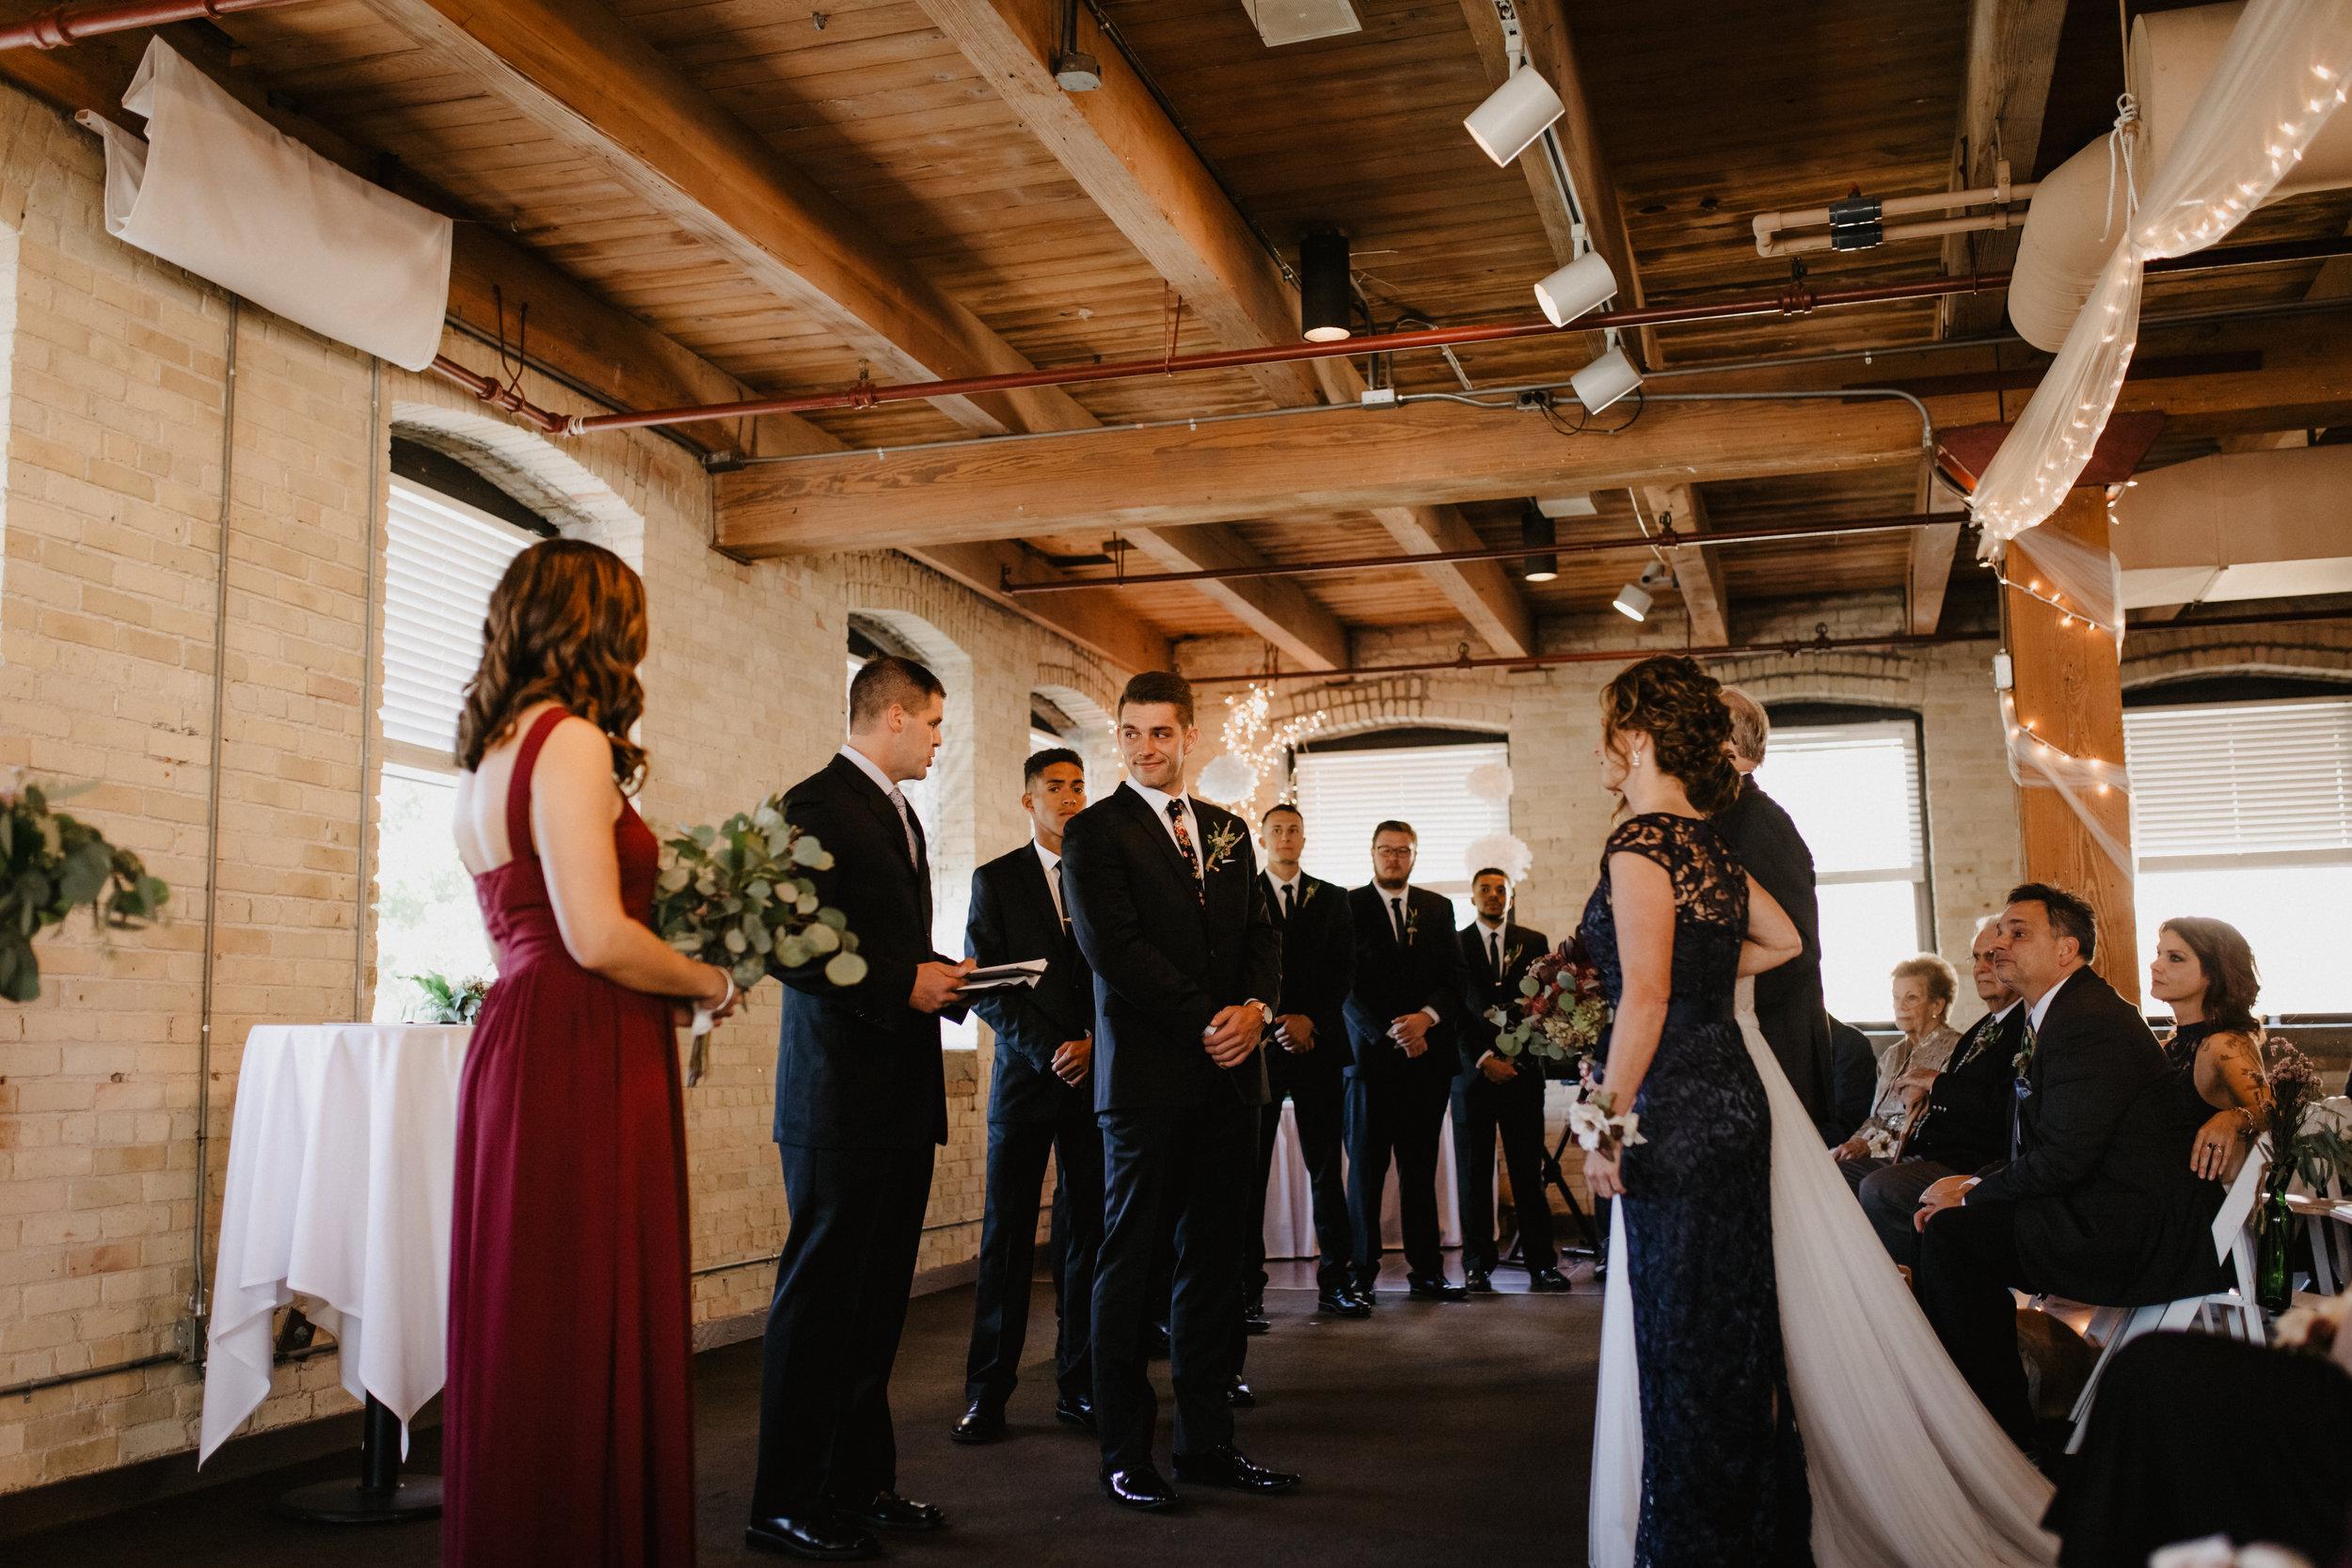 Industrial-Interior-Wedding-Ceremony-Photographer-01